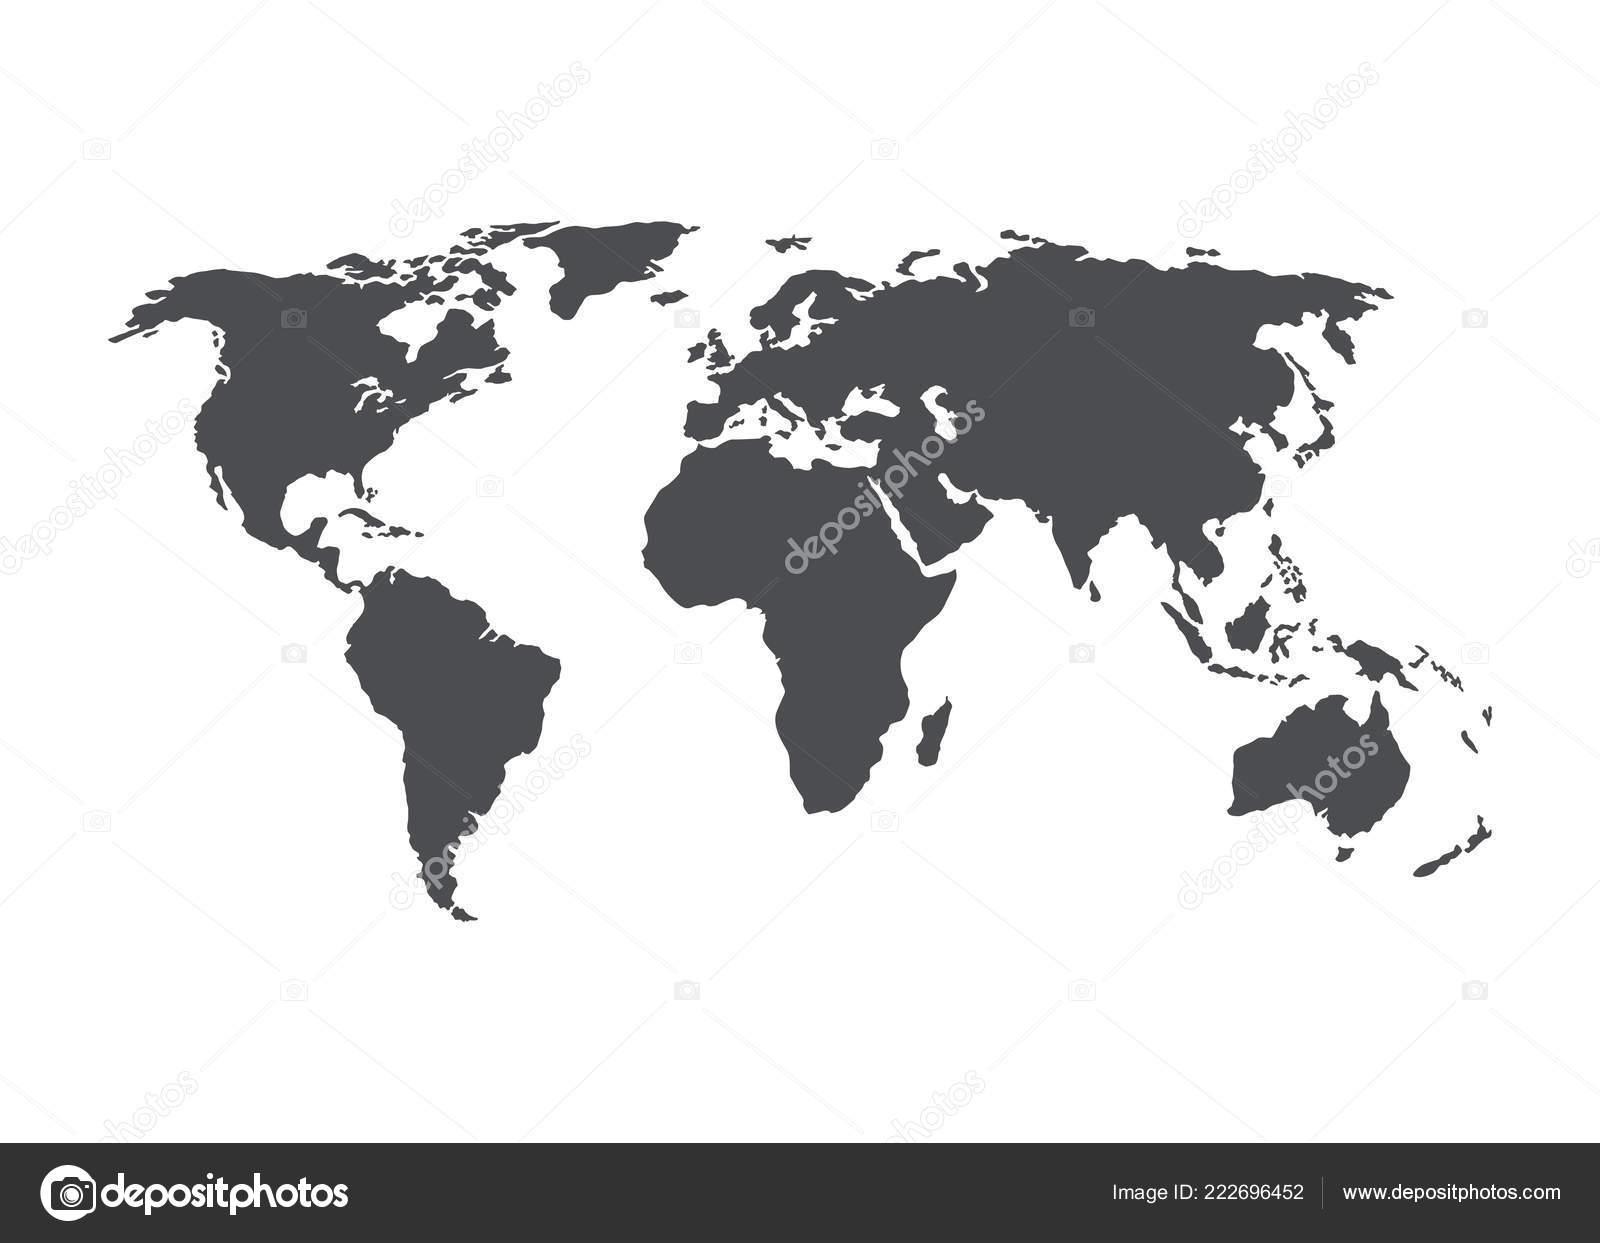 World Map Vector Gray Blank Vector World Map Isolated White — Stock on hp world map, linkedin world map, bank of america world map, fox news world map, craigslist world map, blog world map, country finder world map, ashley madison world map, ask world map, mail world map, cbs world map, iphone world map, skype world map, tcs world map, viewable world map, newspaper world map, email world map, airbnb world map, att world map,